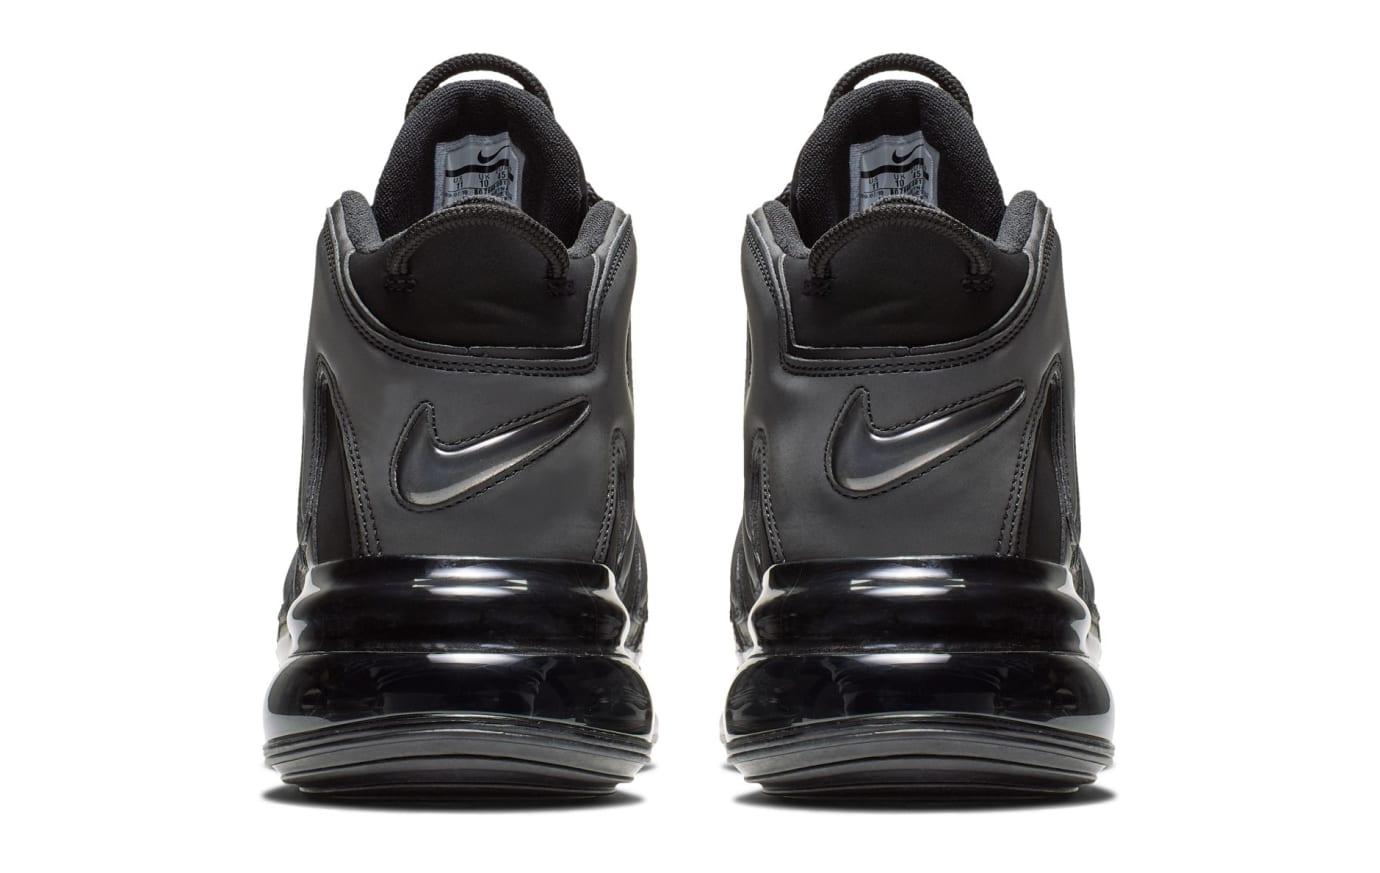 c11d2eaa7a8 Image via US 11 Nike Nike Air More Uptempo 720  Black  Heel